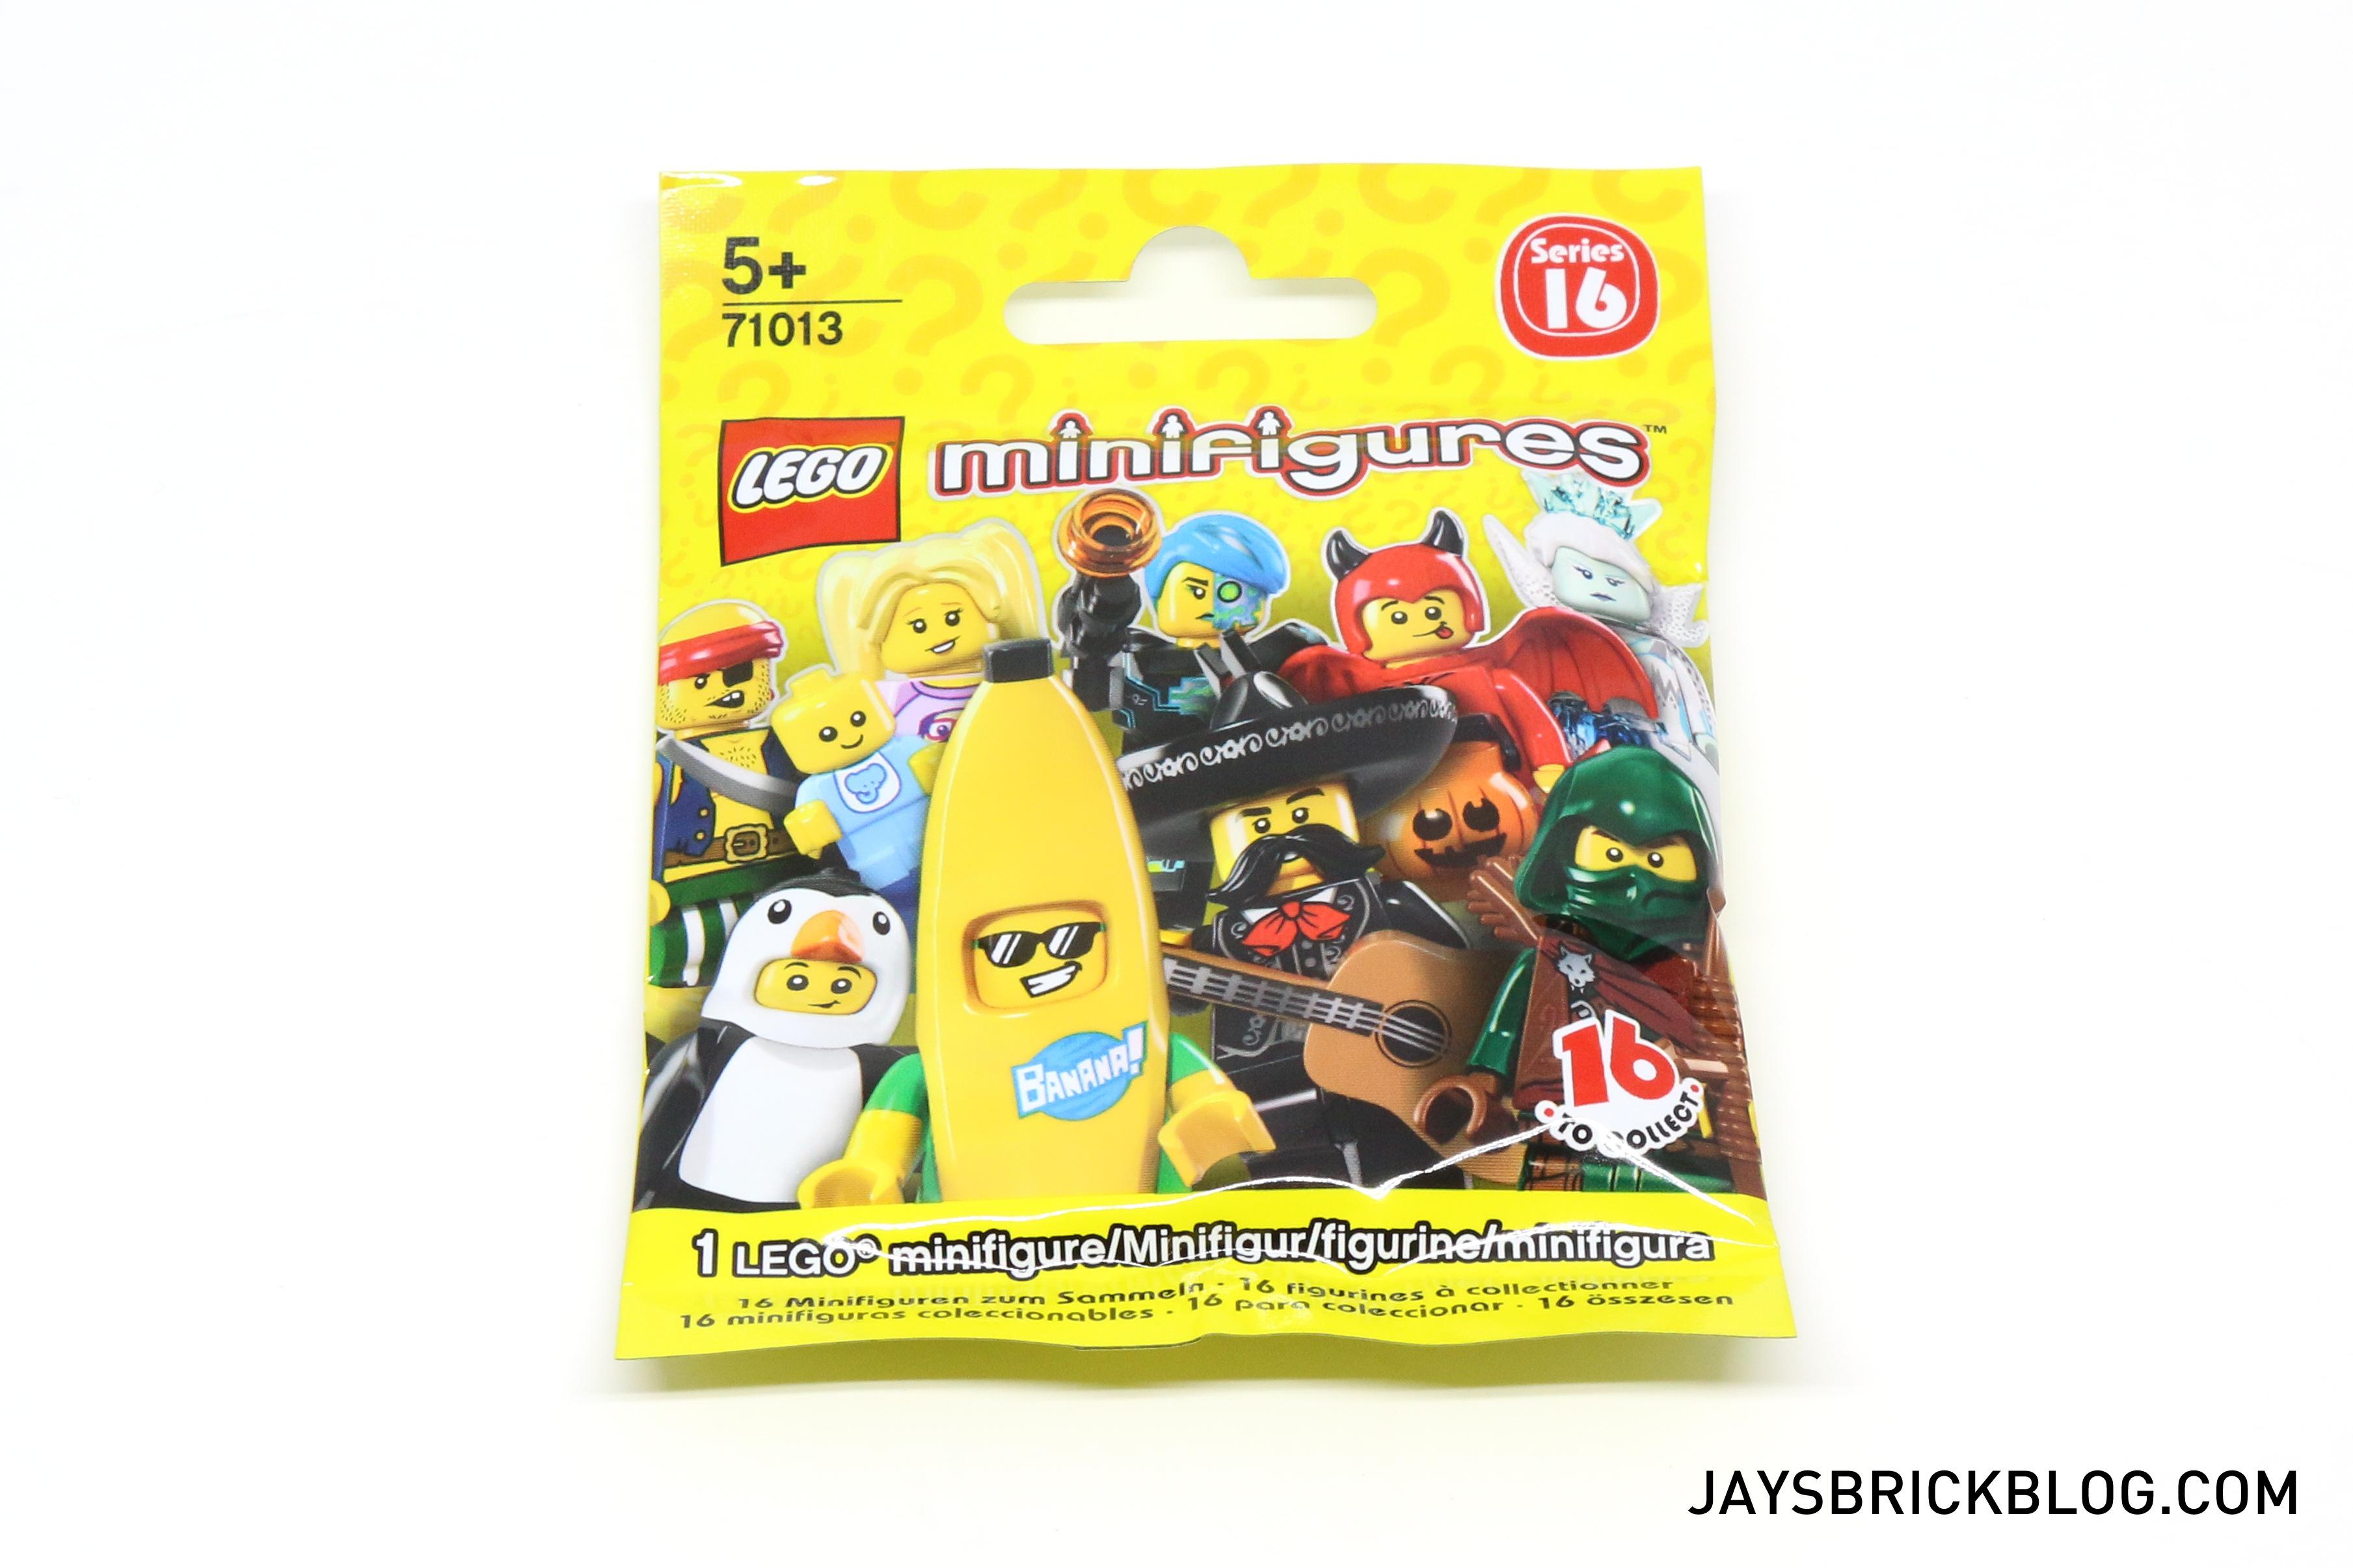 5 BLACK DESERT SCORPIONS ACCESSORIES FOR MINIFIGURES animals 5 Lego parts